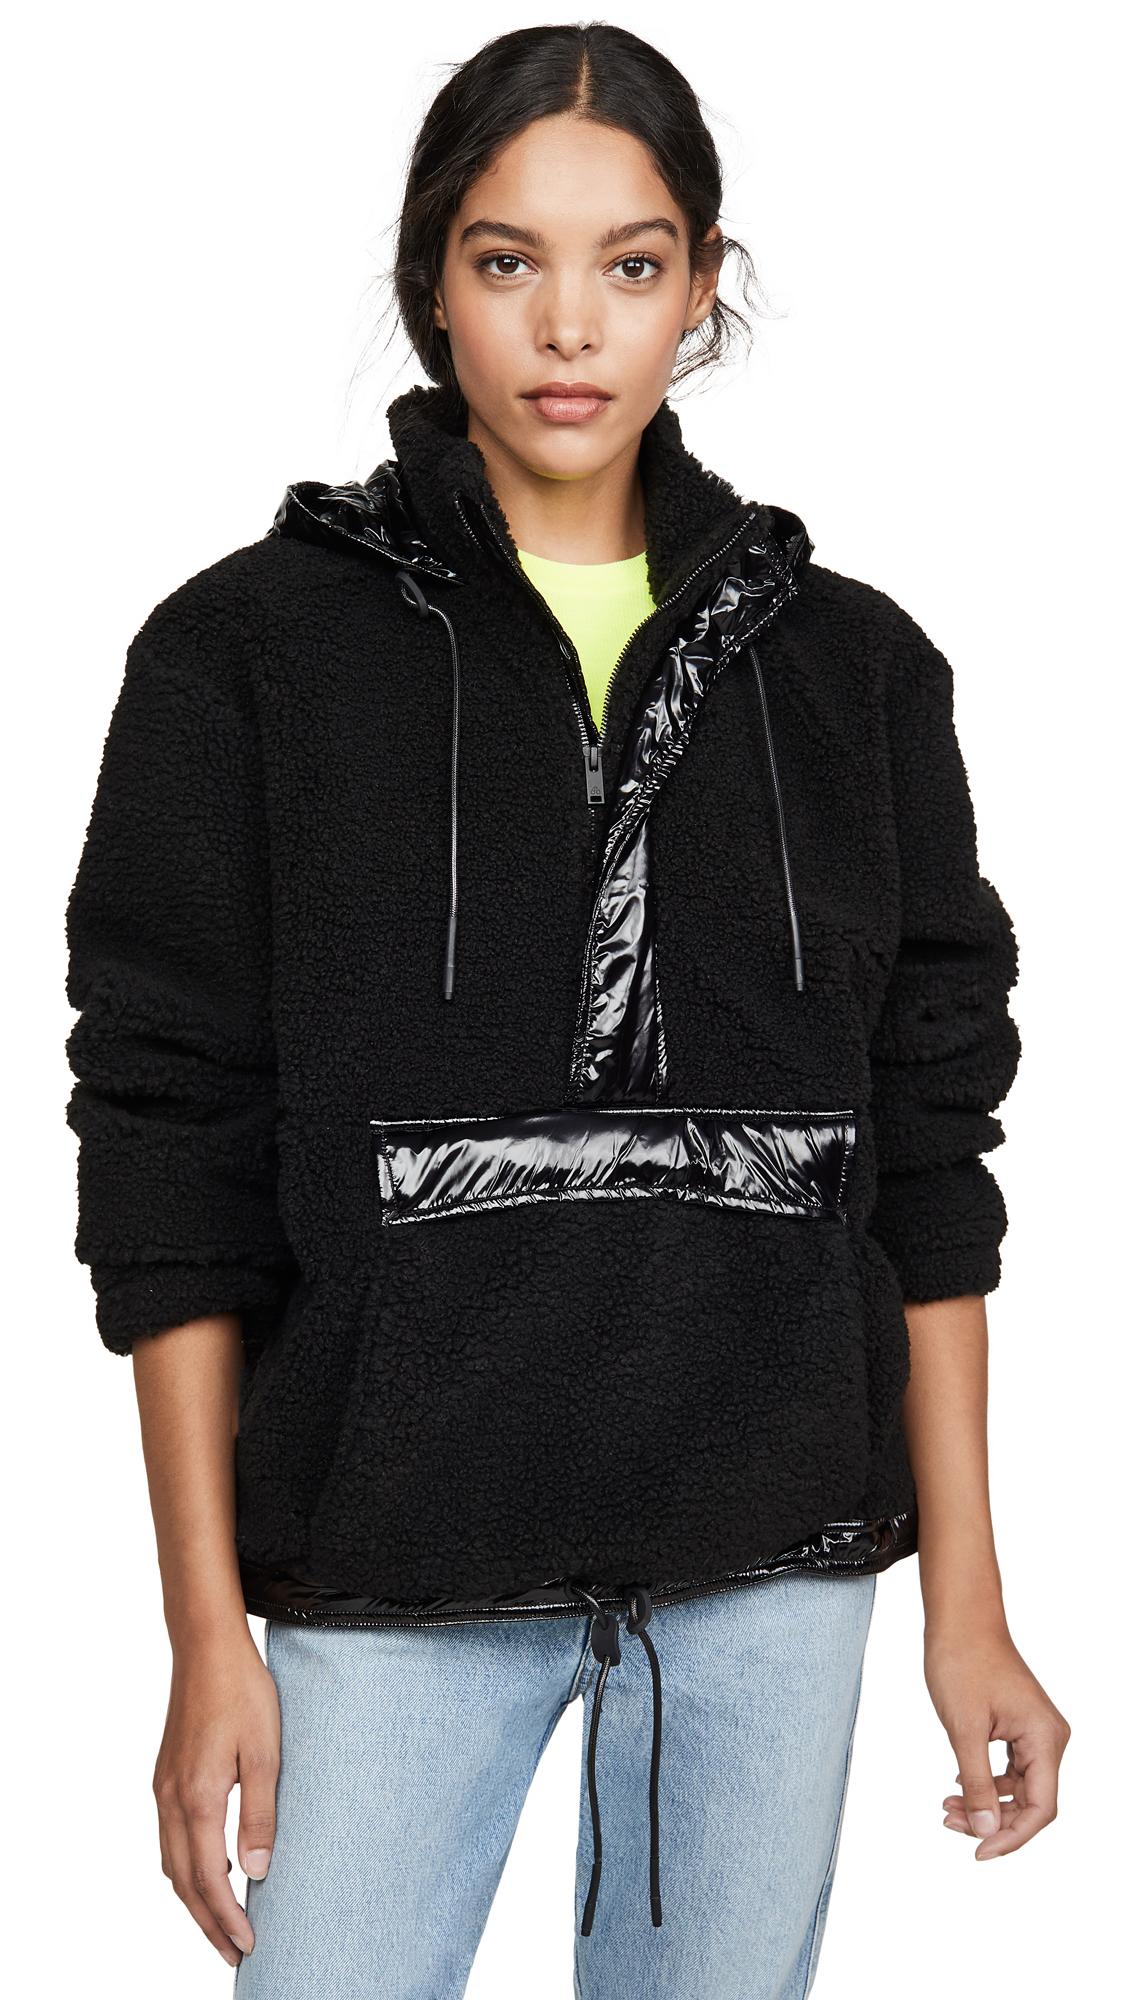 Buy Moose Knuckles Sherpa Pullover Jacket online beautiful Moose Knuckles Jackets, Coats, Down Jackets